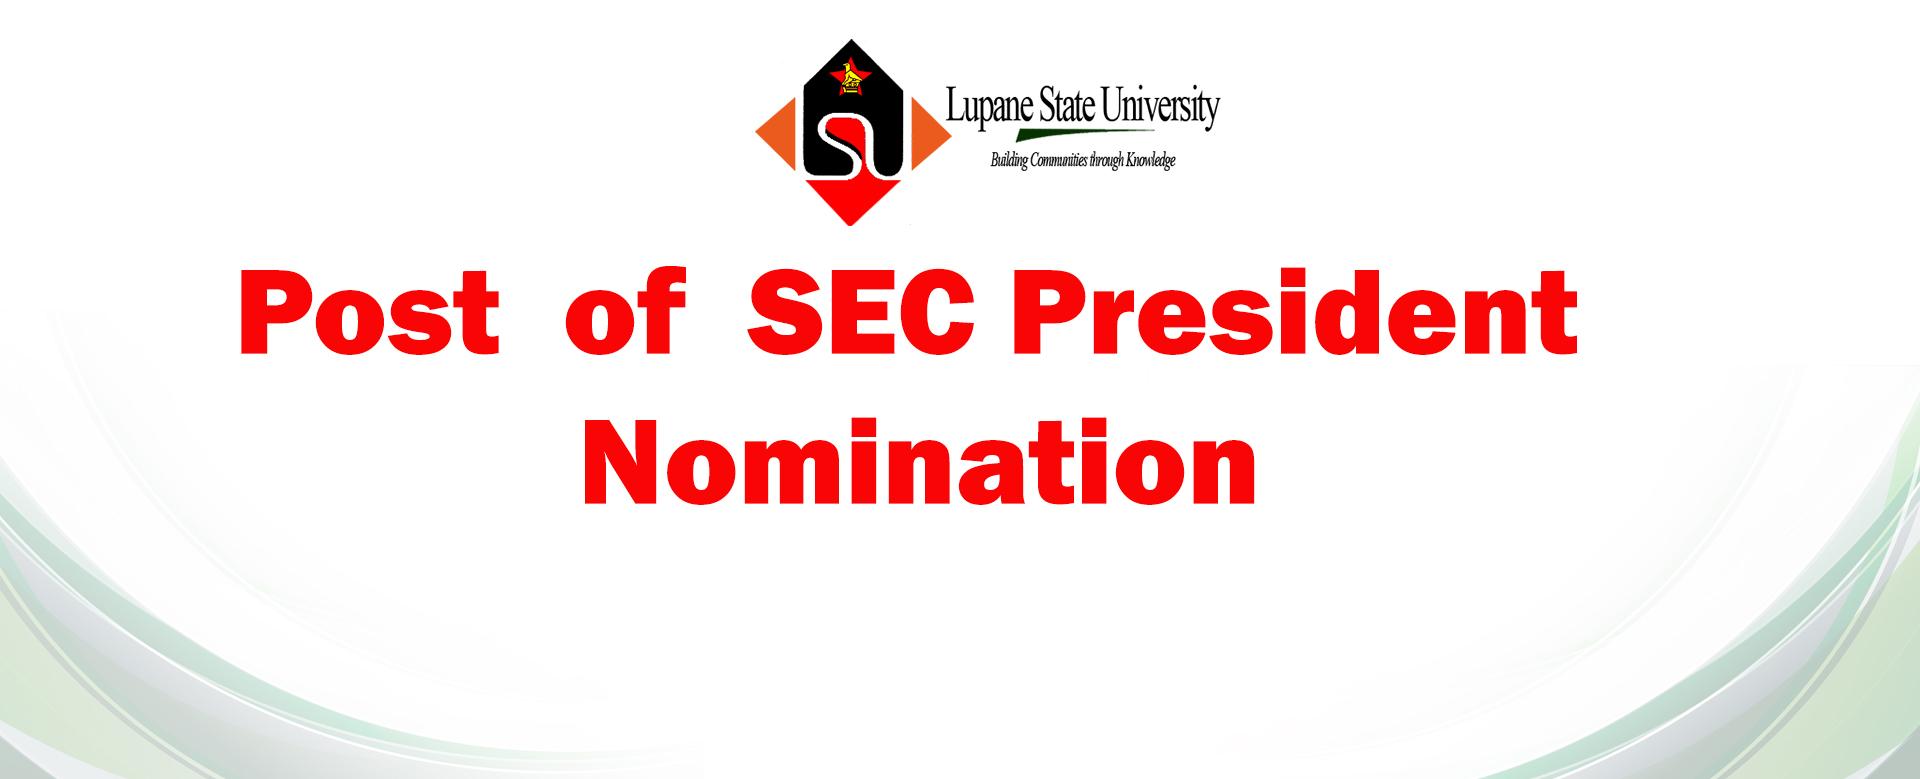 SEC President Nominations